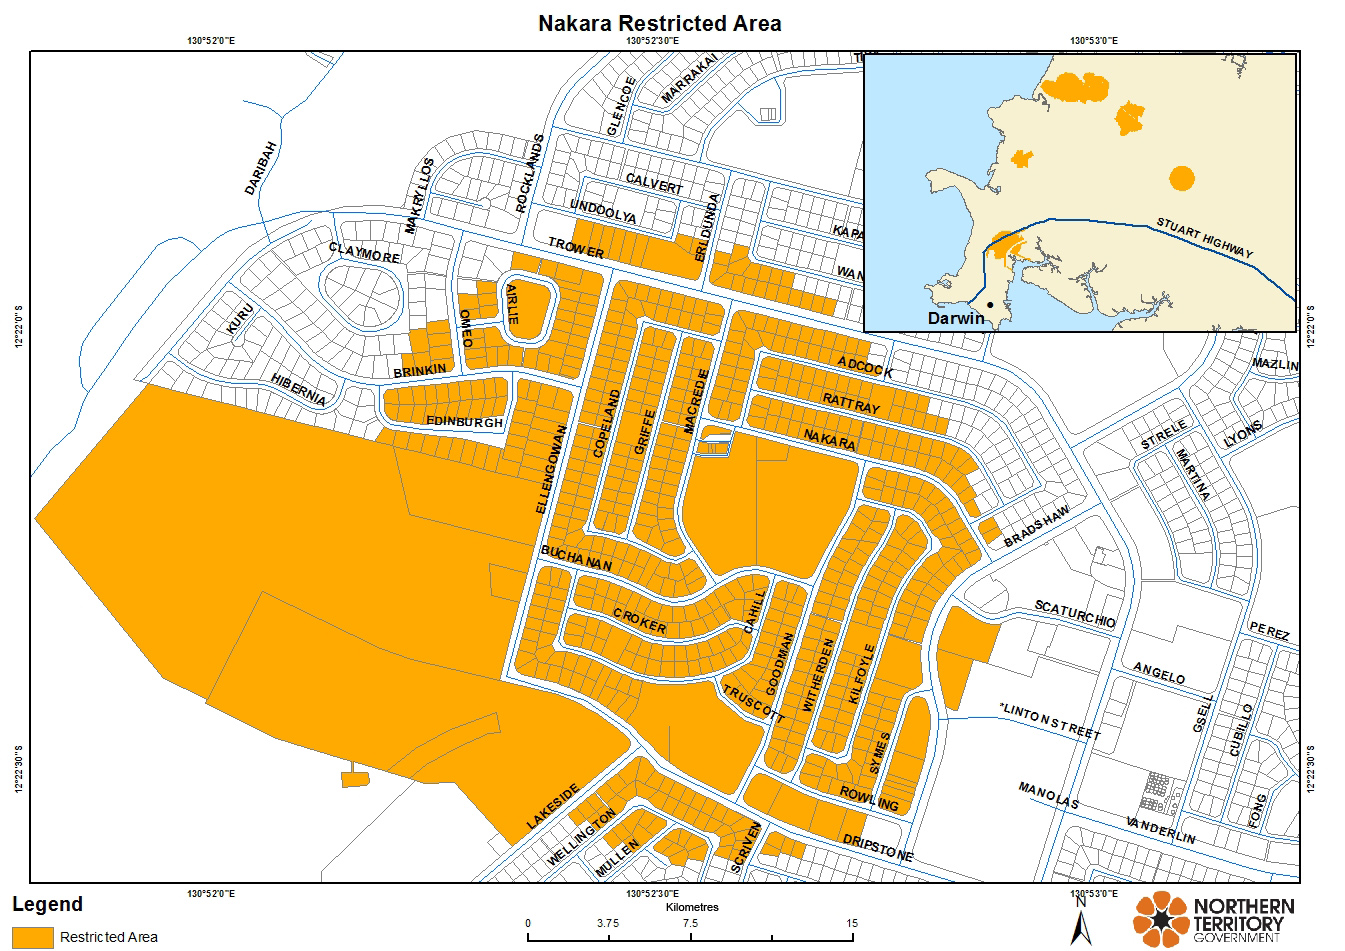 Nakara restricted area